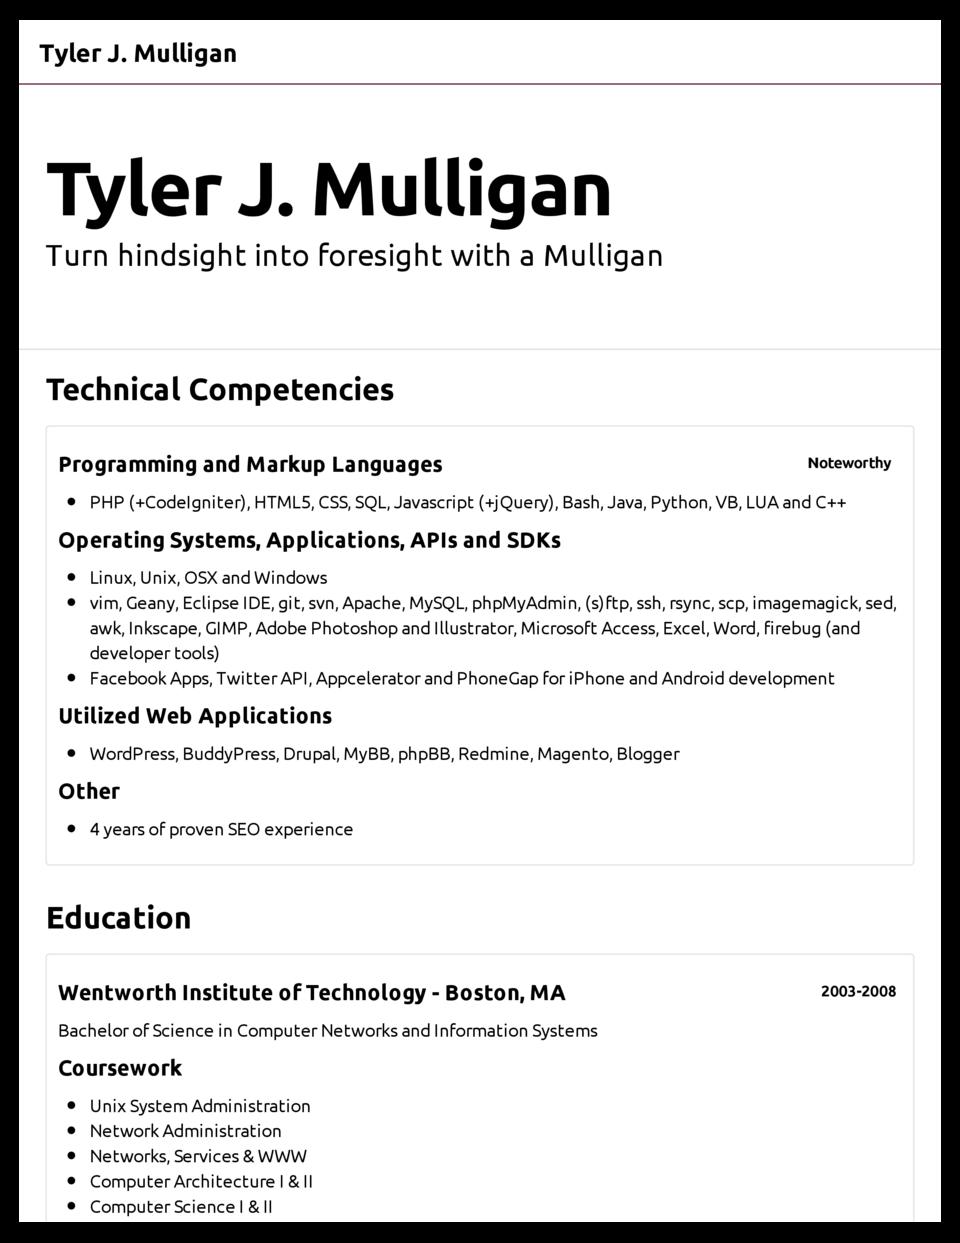 Basic Resume Template Pdf